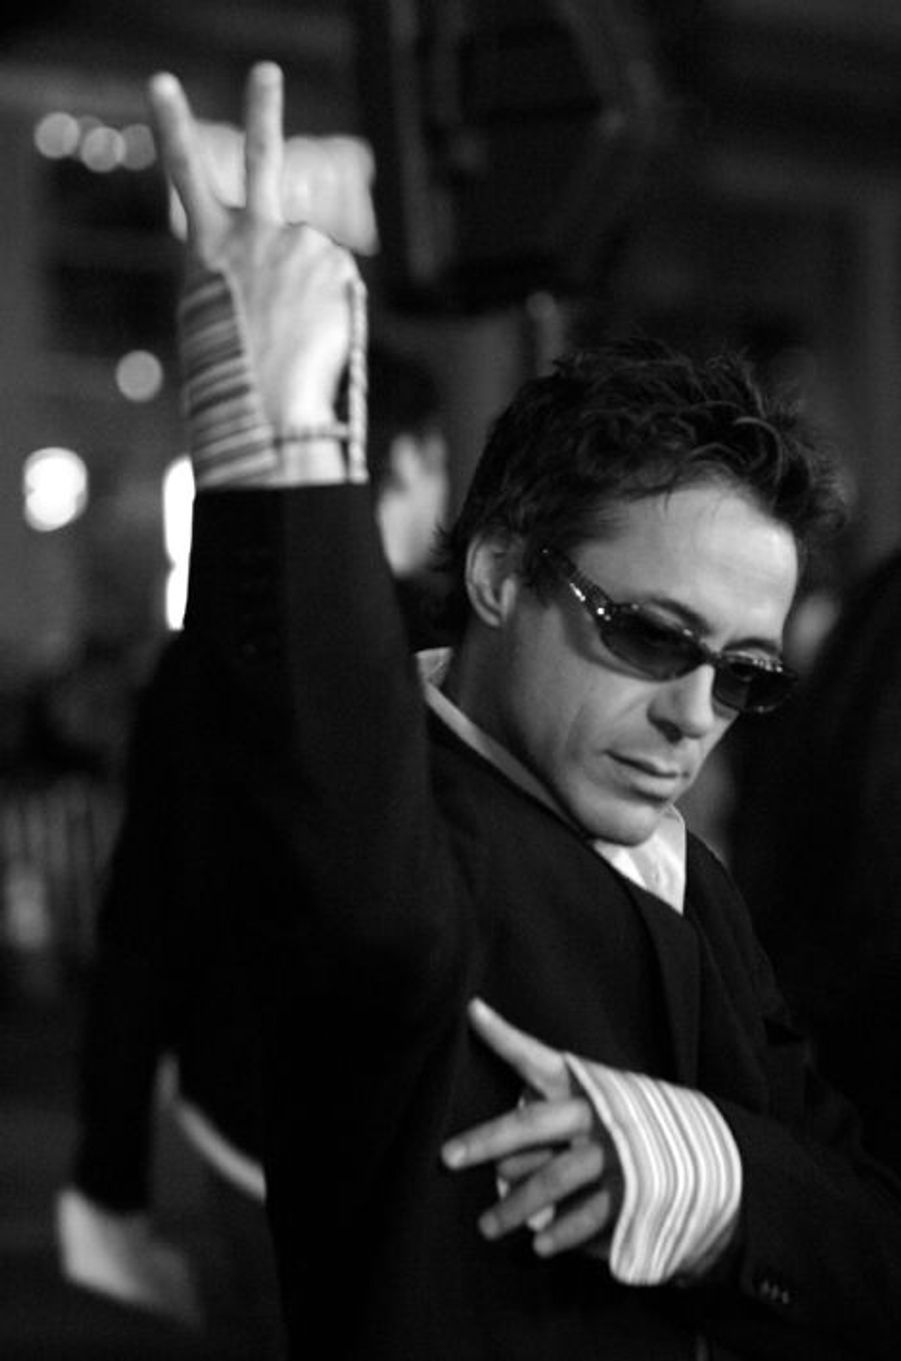 Robert Downey Jr. à 39 ans en 2004